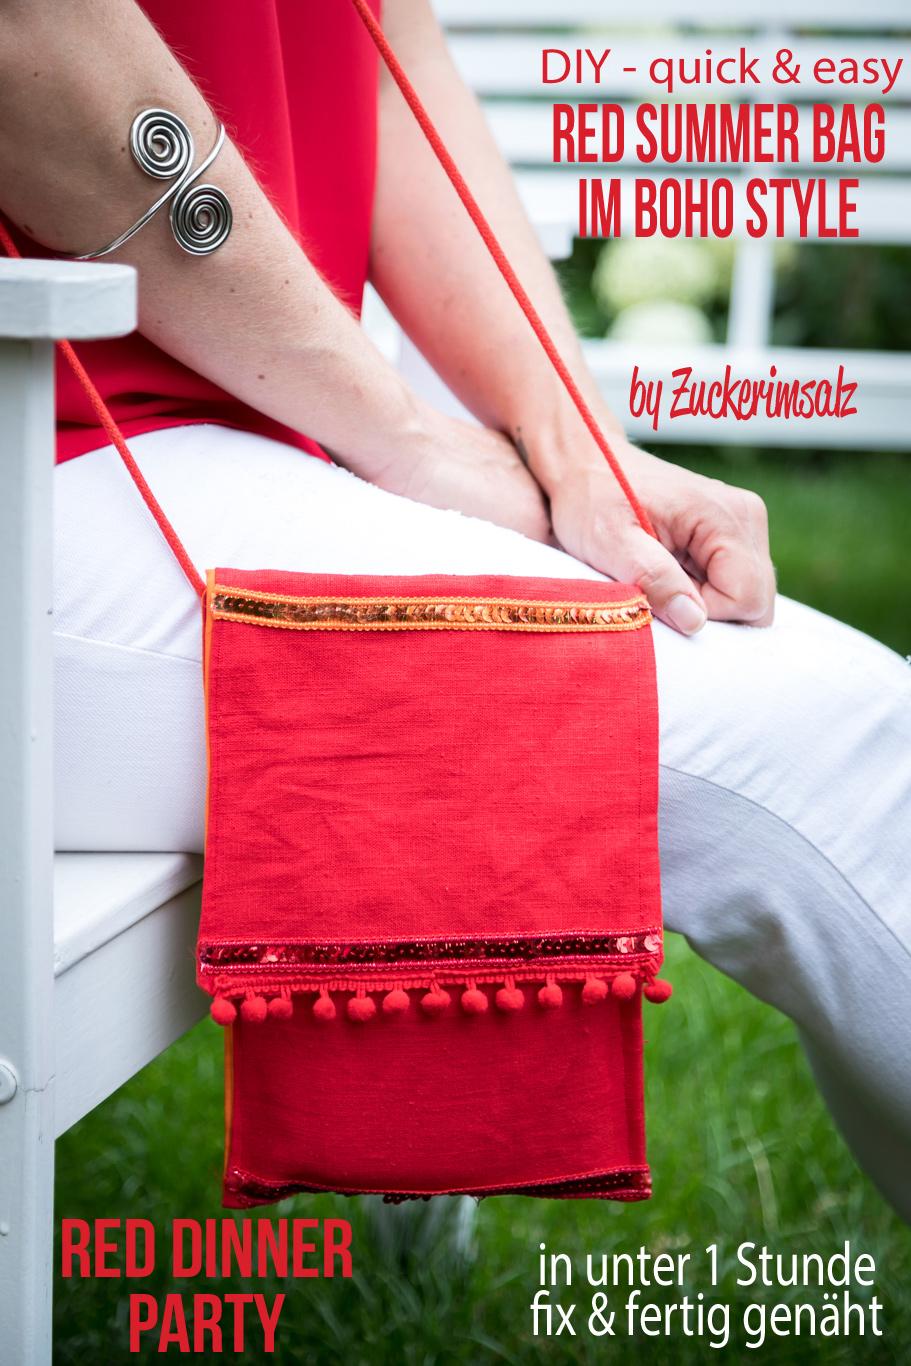 Red Summer Bag im Boho Style … DIY in unter 1 Stunde fix & fertig genäht